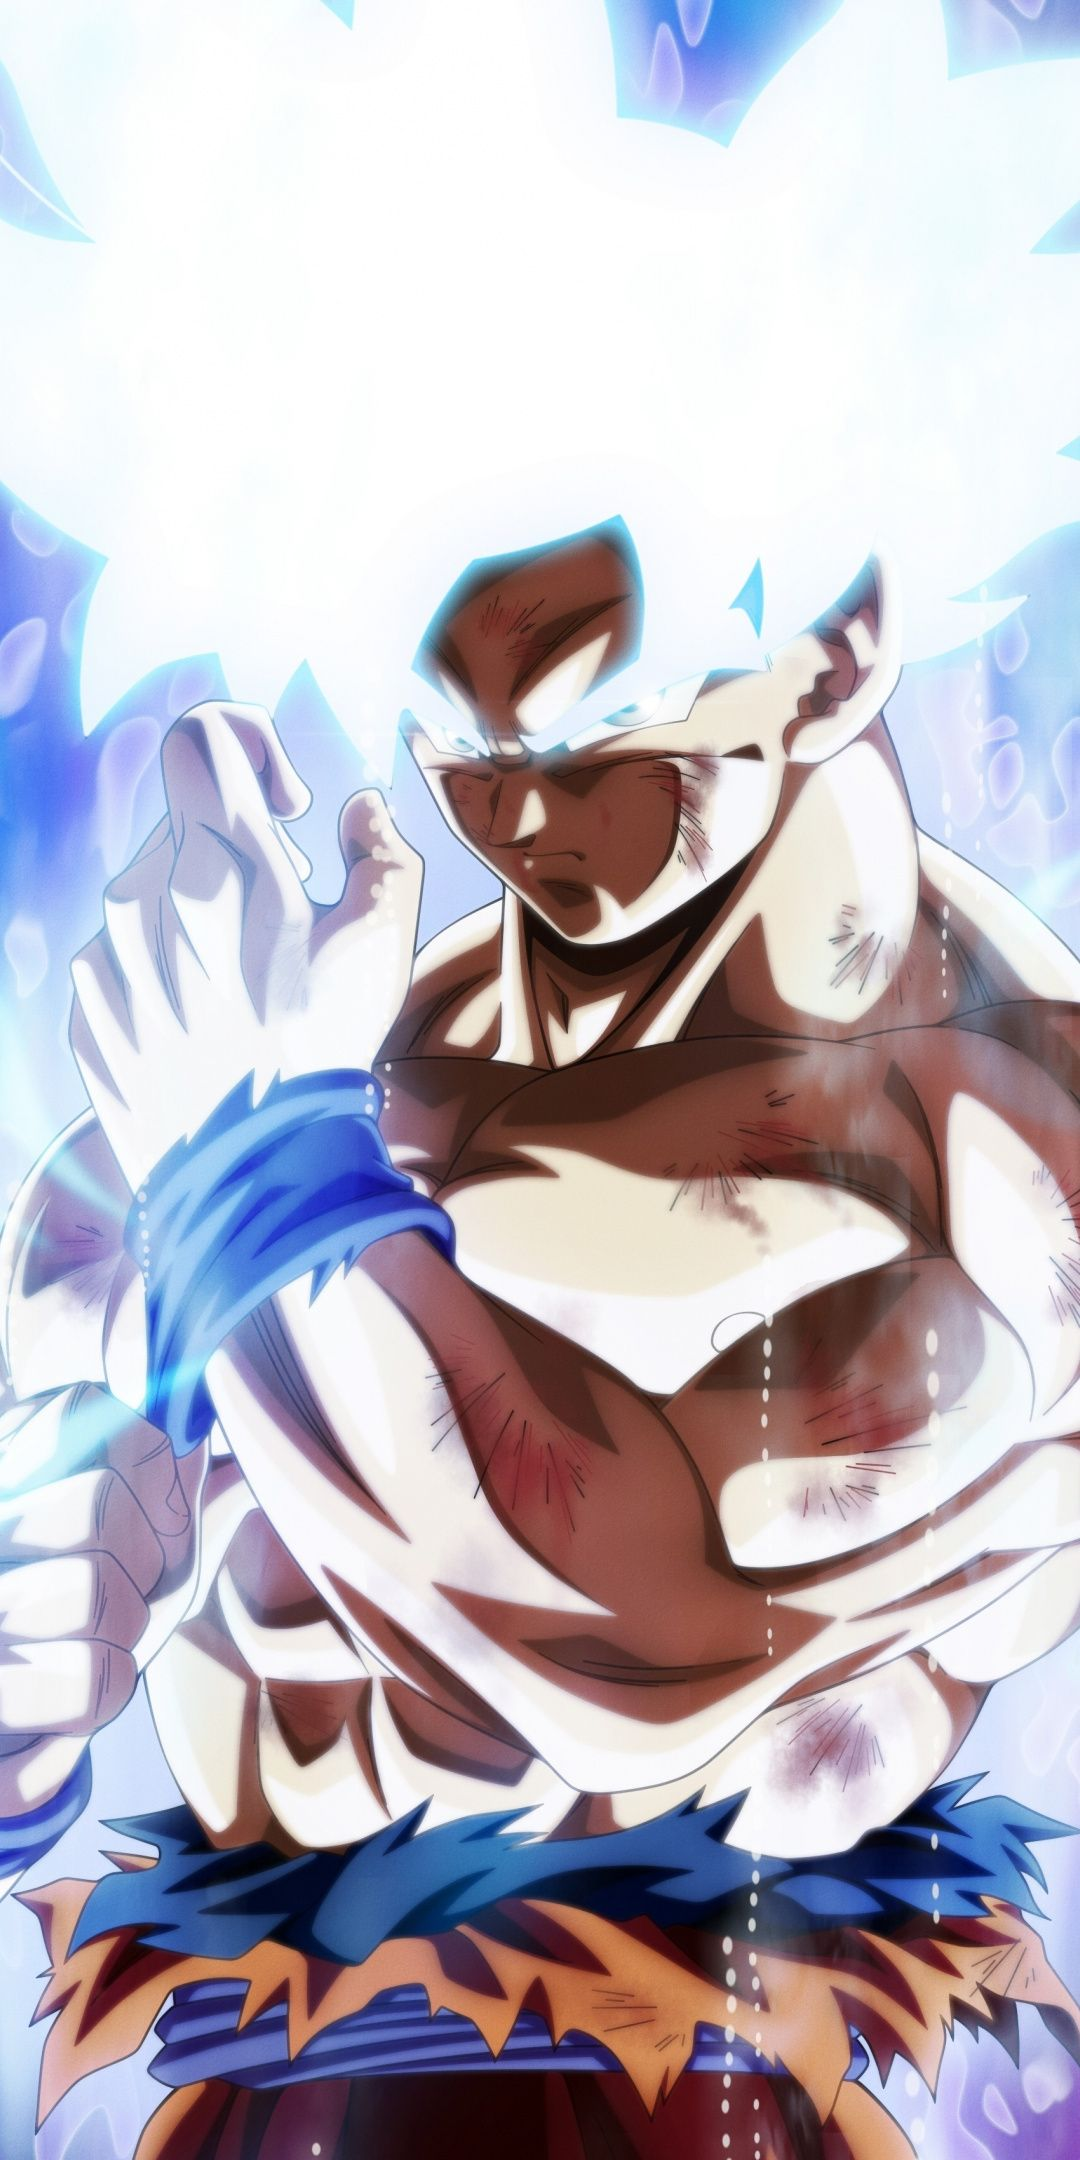 Download 1080x2160 Wallpaper Glow Goku Dragon Ball Super Anime Art Honor 7x H Dragon Ball Super Wallpapers Dragon Ball Wallpapers Anime Dragon Ball Super